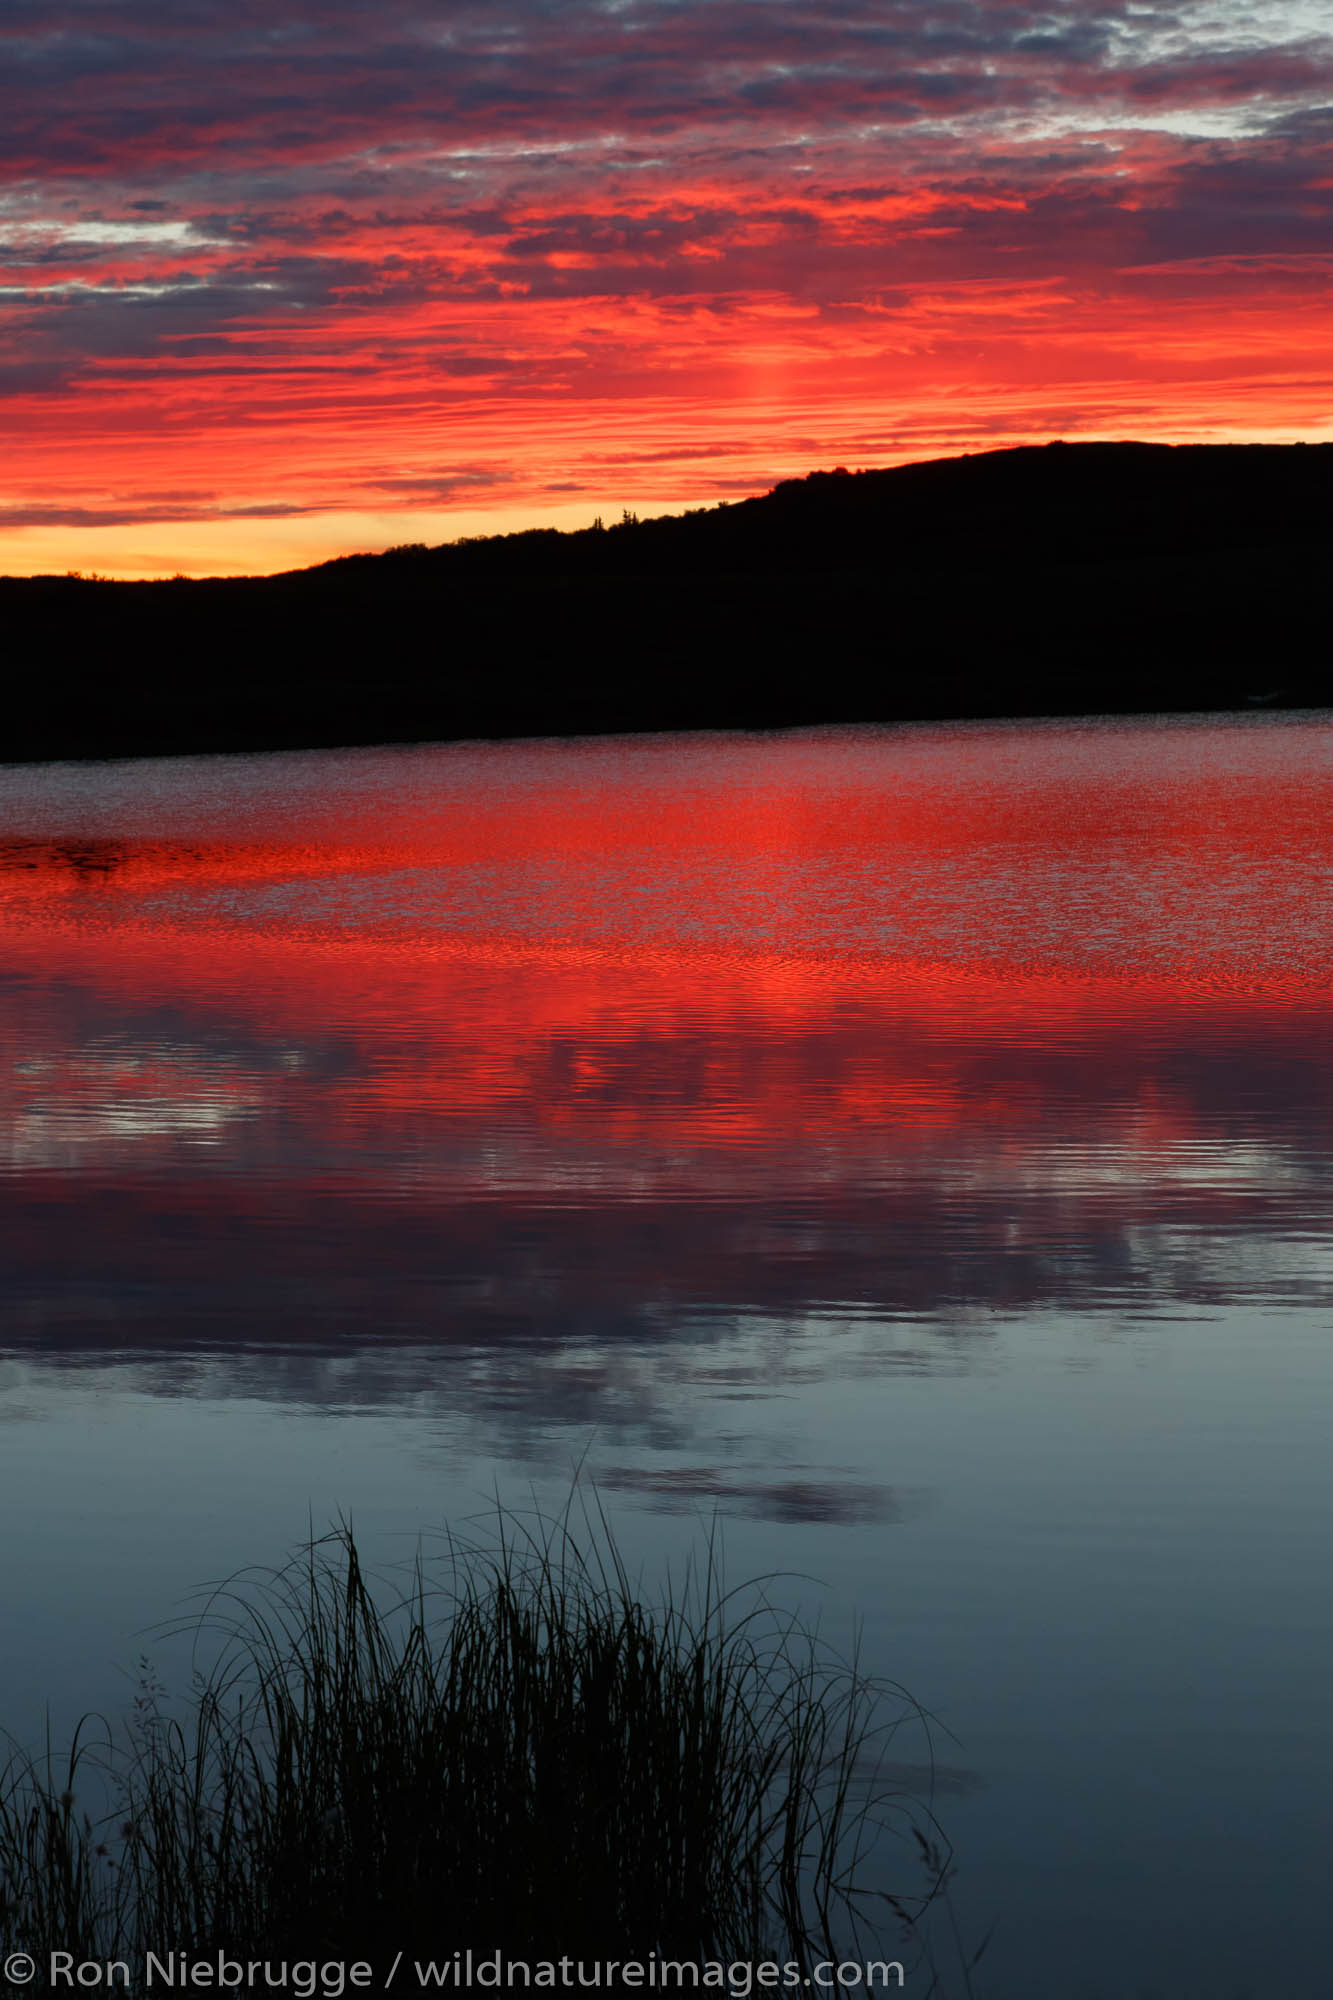 Sunset in Denali National Park, Alaska.